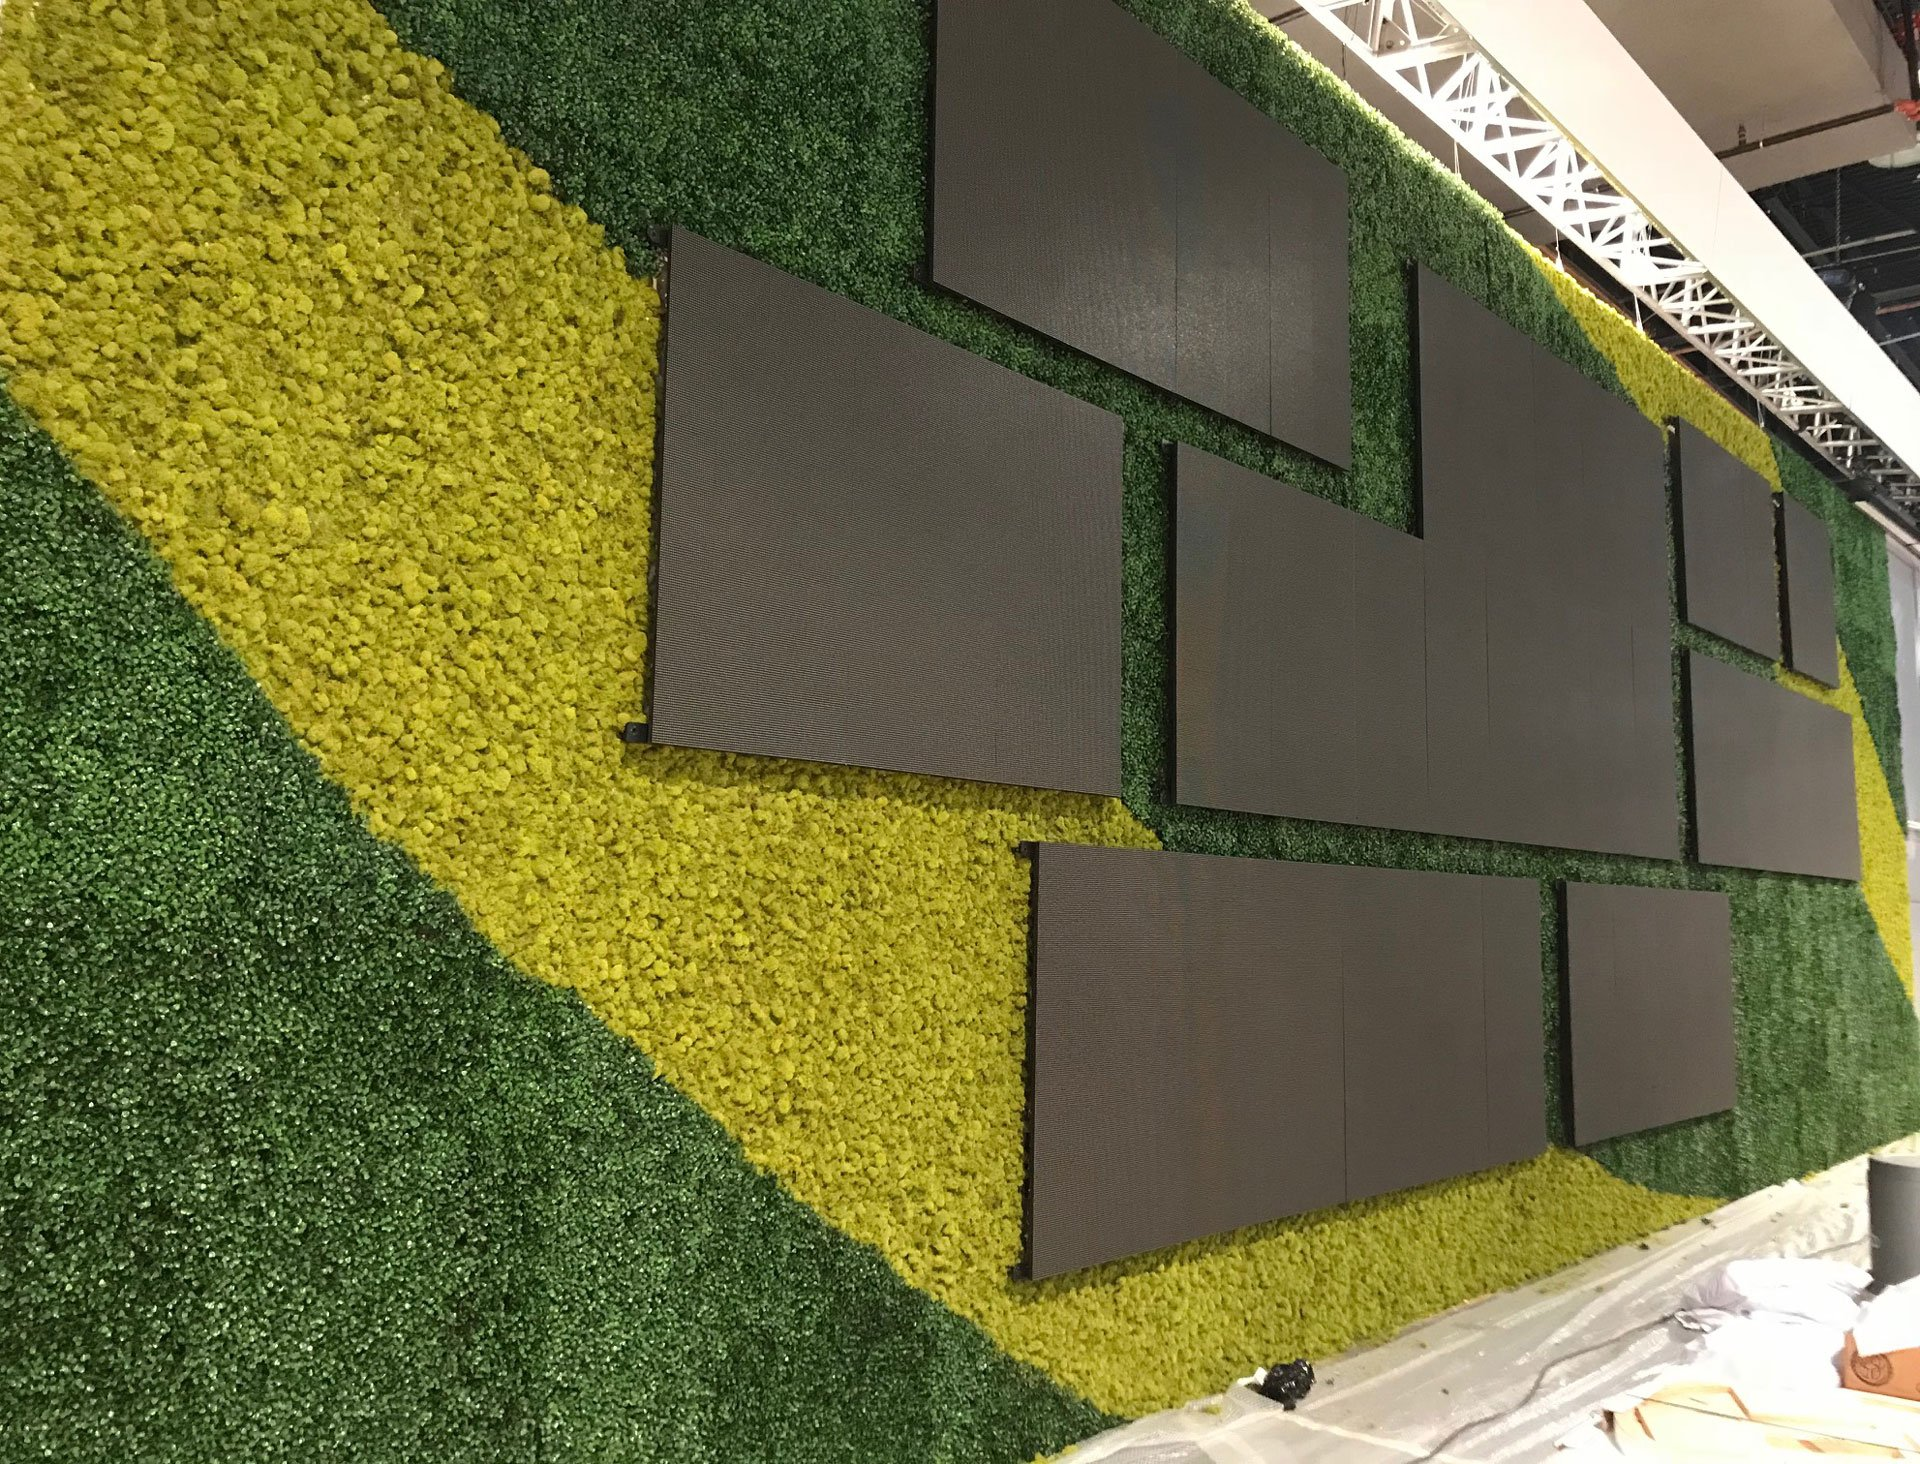 ICSC Las Vegas Show, Large Faux Green Walls - Make Be-Leaves